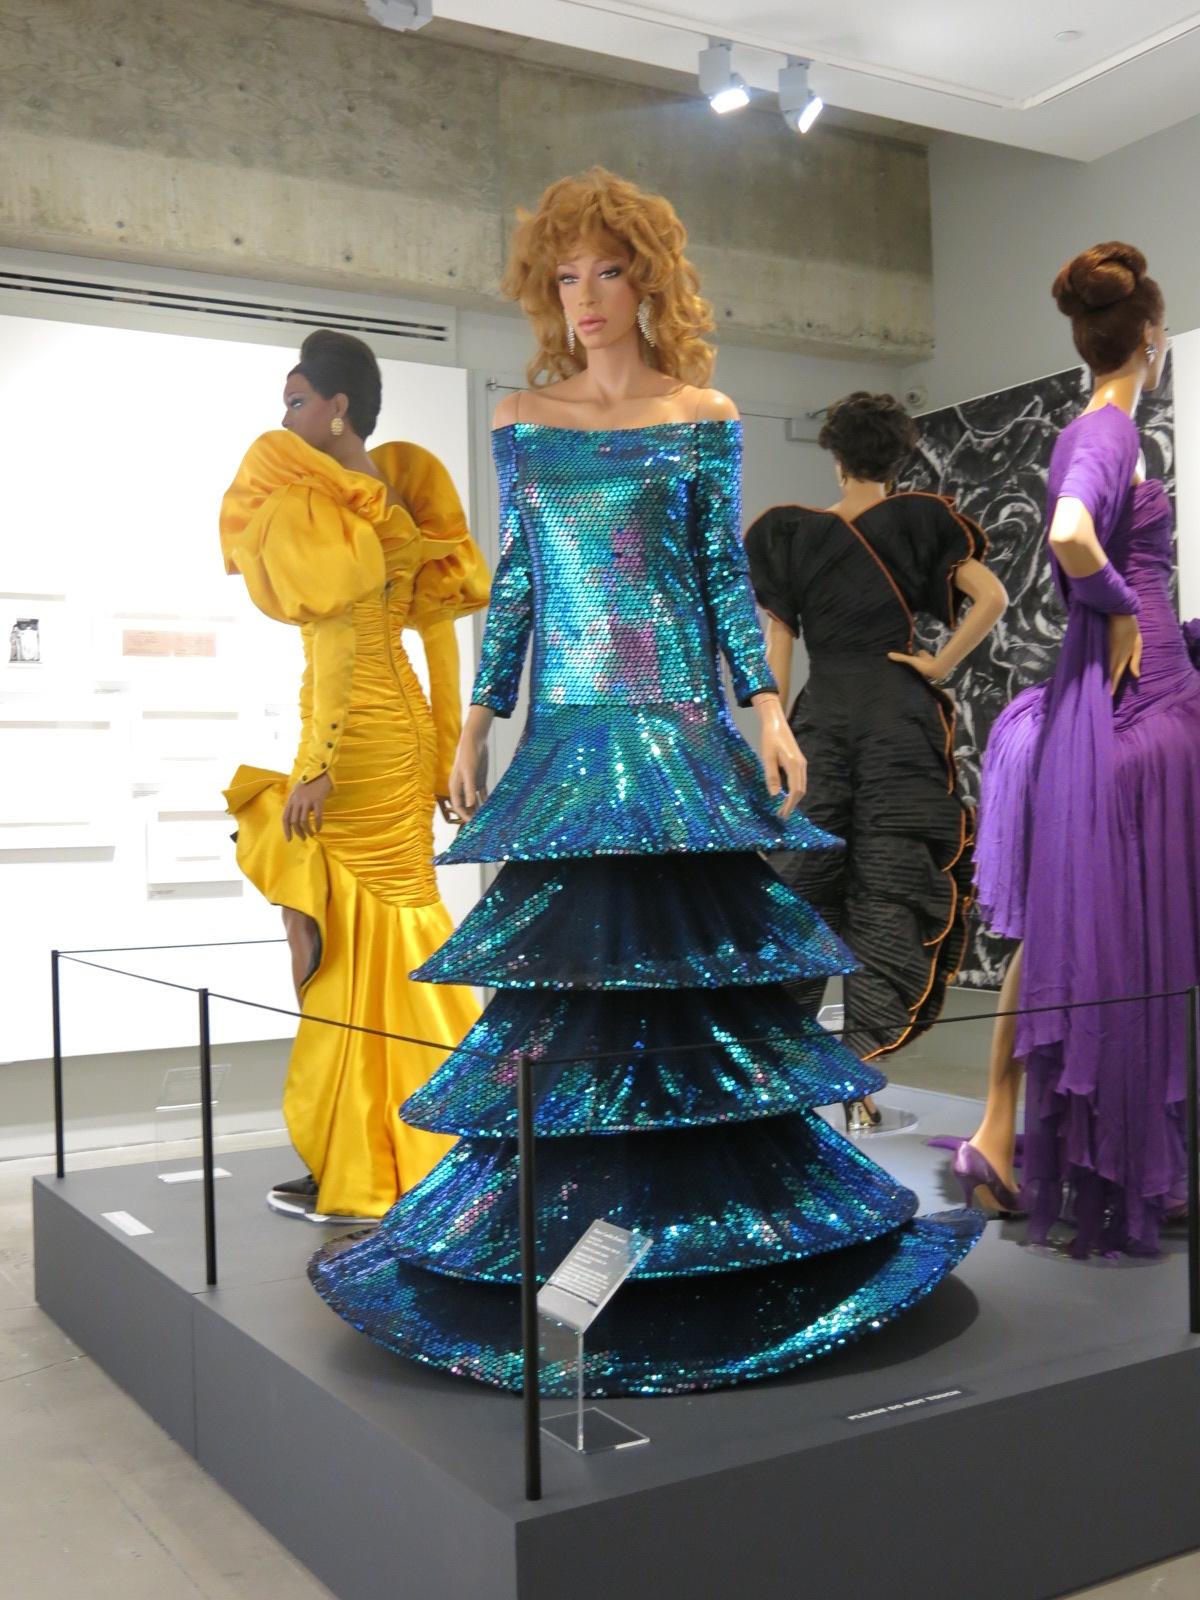 Atlanta Photo Diary: Ebony Fashion Fair Exhibit, Liz Best, Liz-Best, Museum of Design Atlanta, exhibition, fashion, Erica Johnson, Ebony magazine, history of fashion fair,